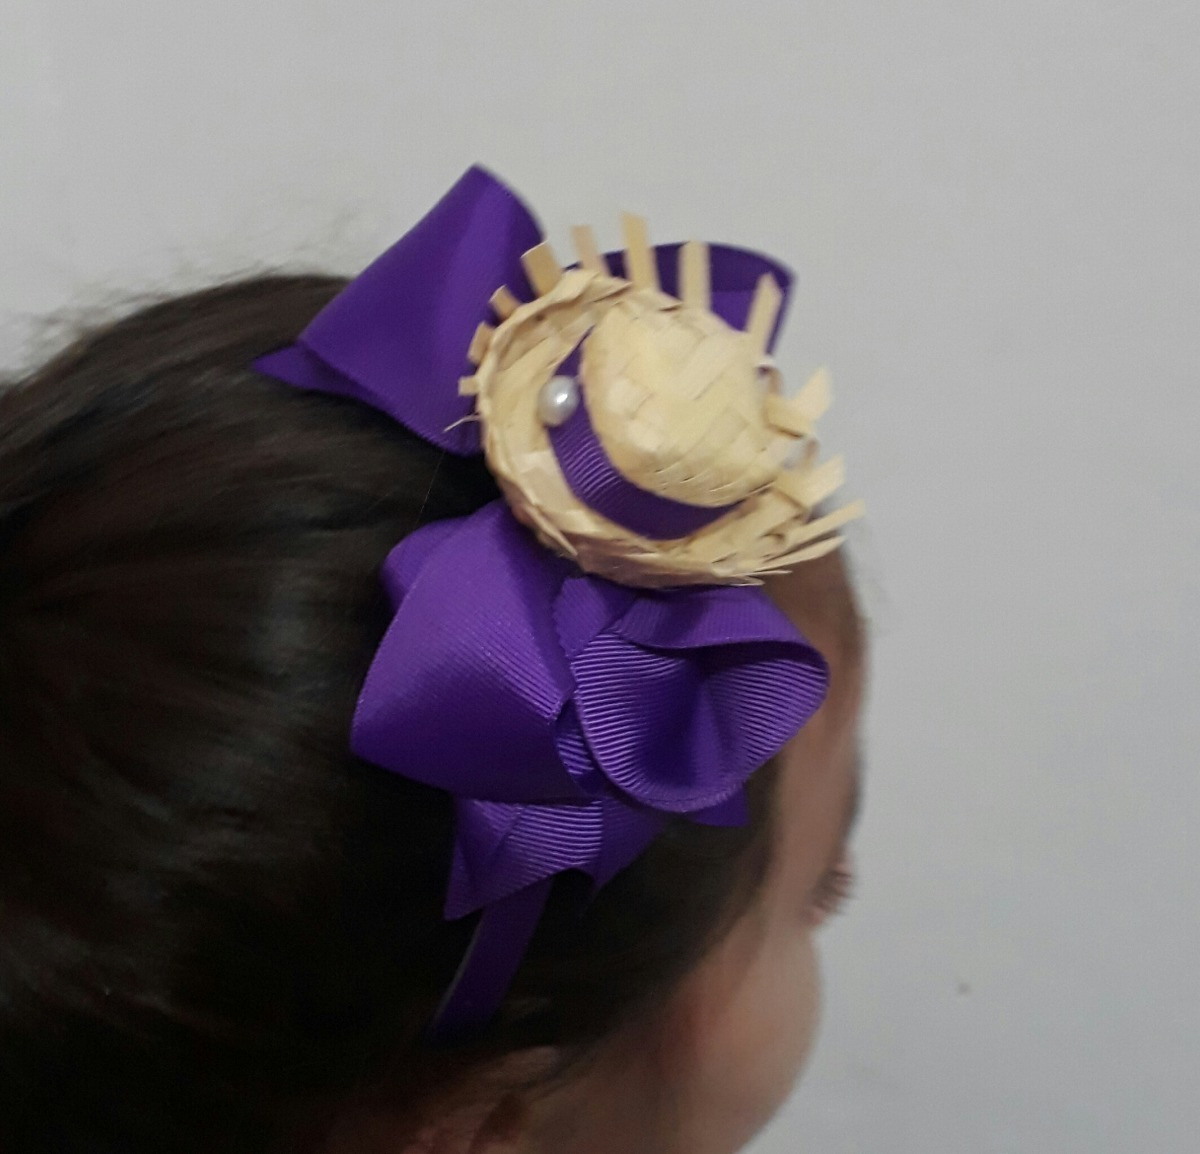 bc0eea31e9160 tiara festa junina mini chapeu caipira enfeite de cabelo. Carregando zoom.